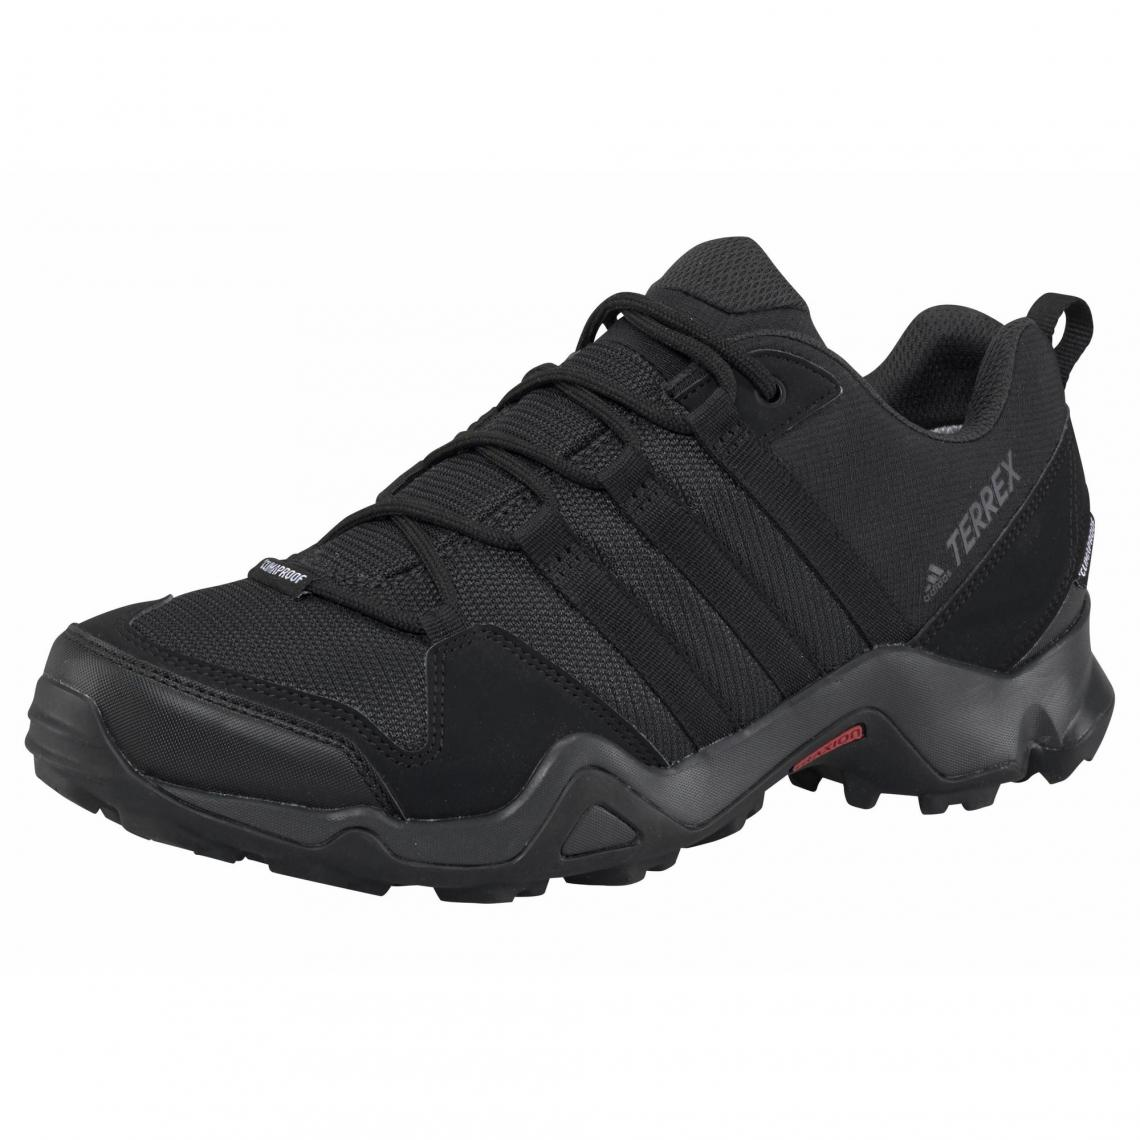 Chaussures de sport d'extérieur homme Terrex AX2 CP adidas  d6l6A